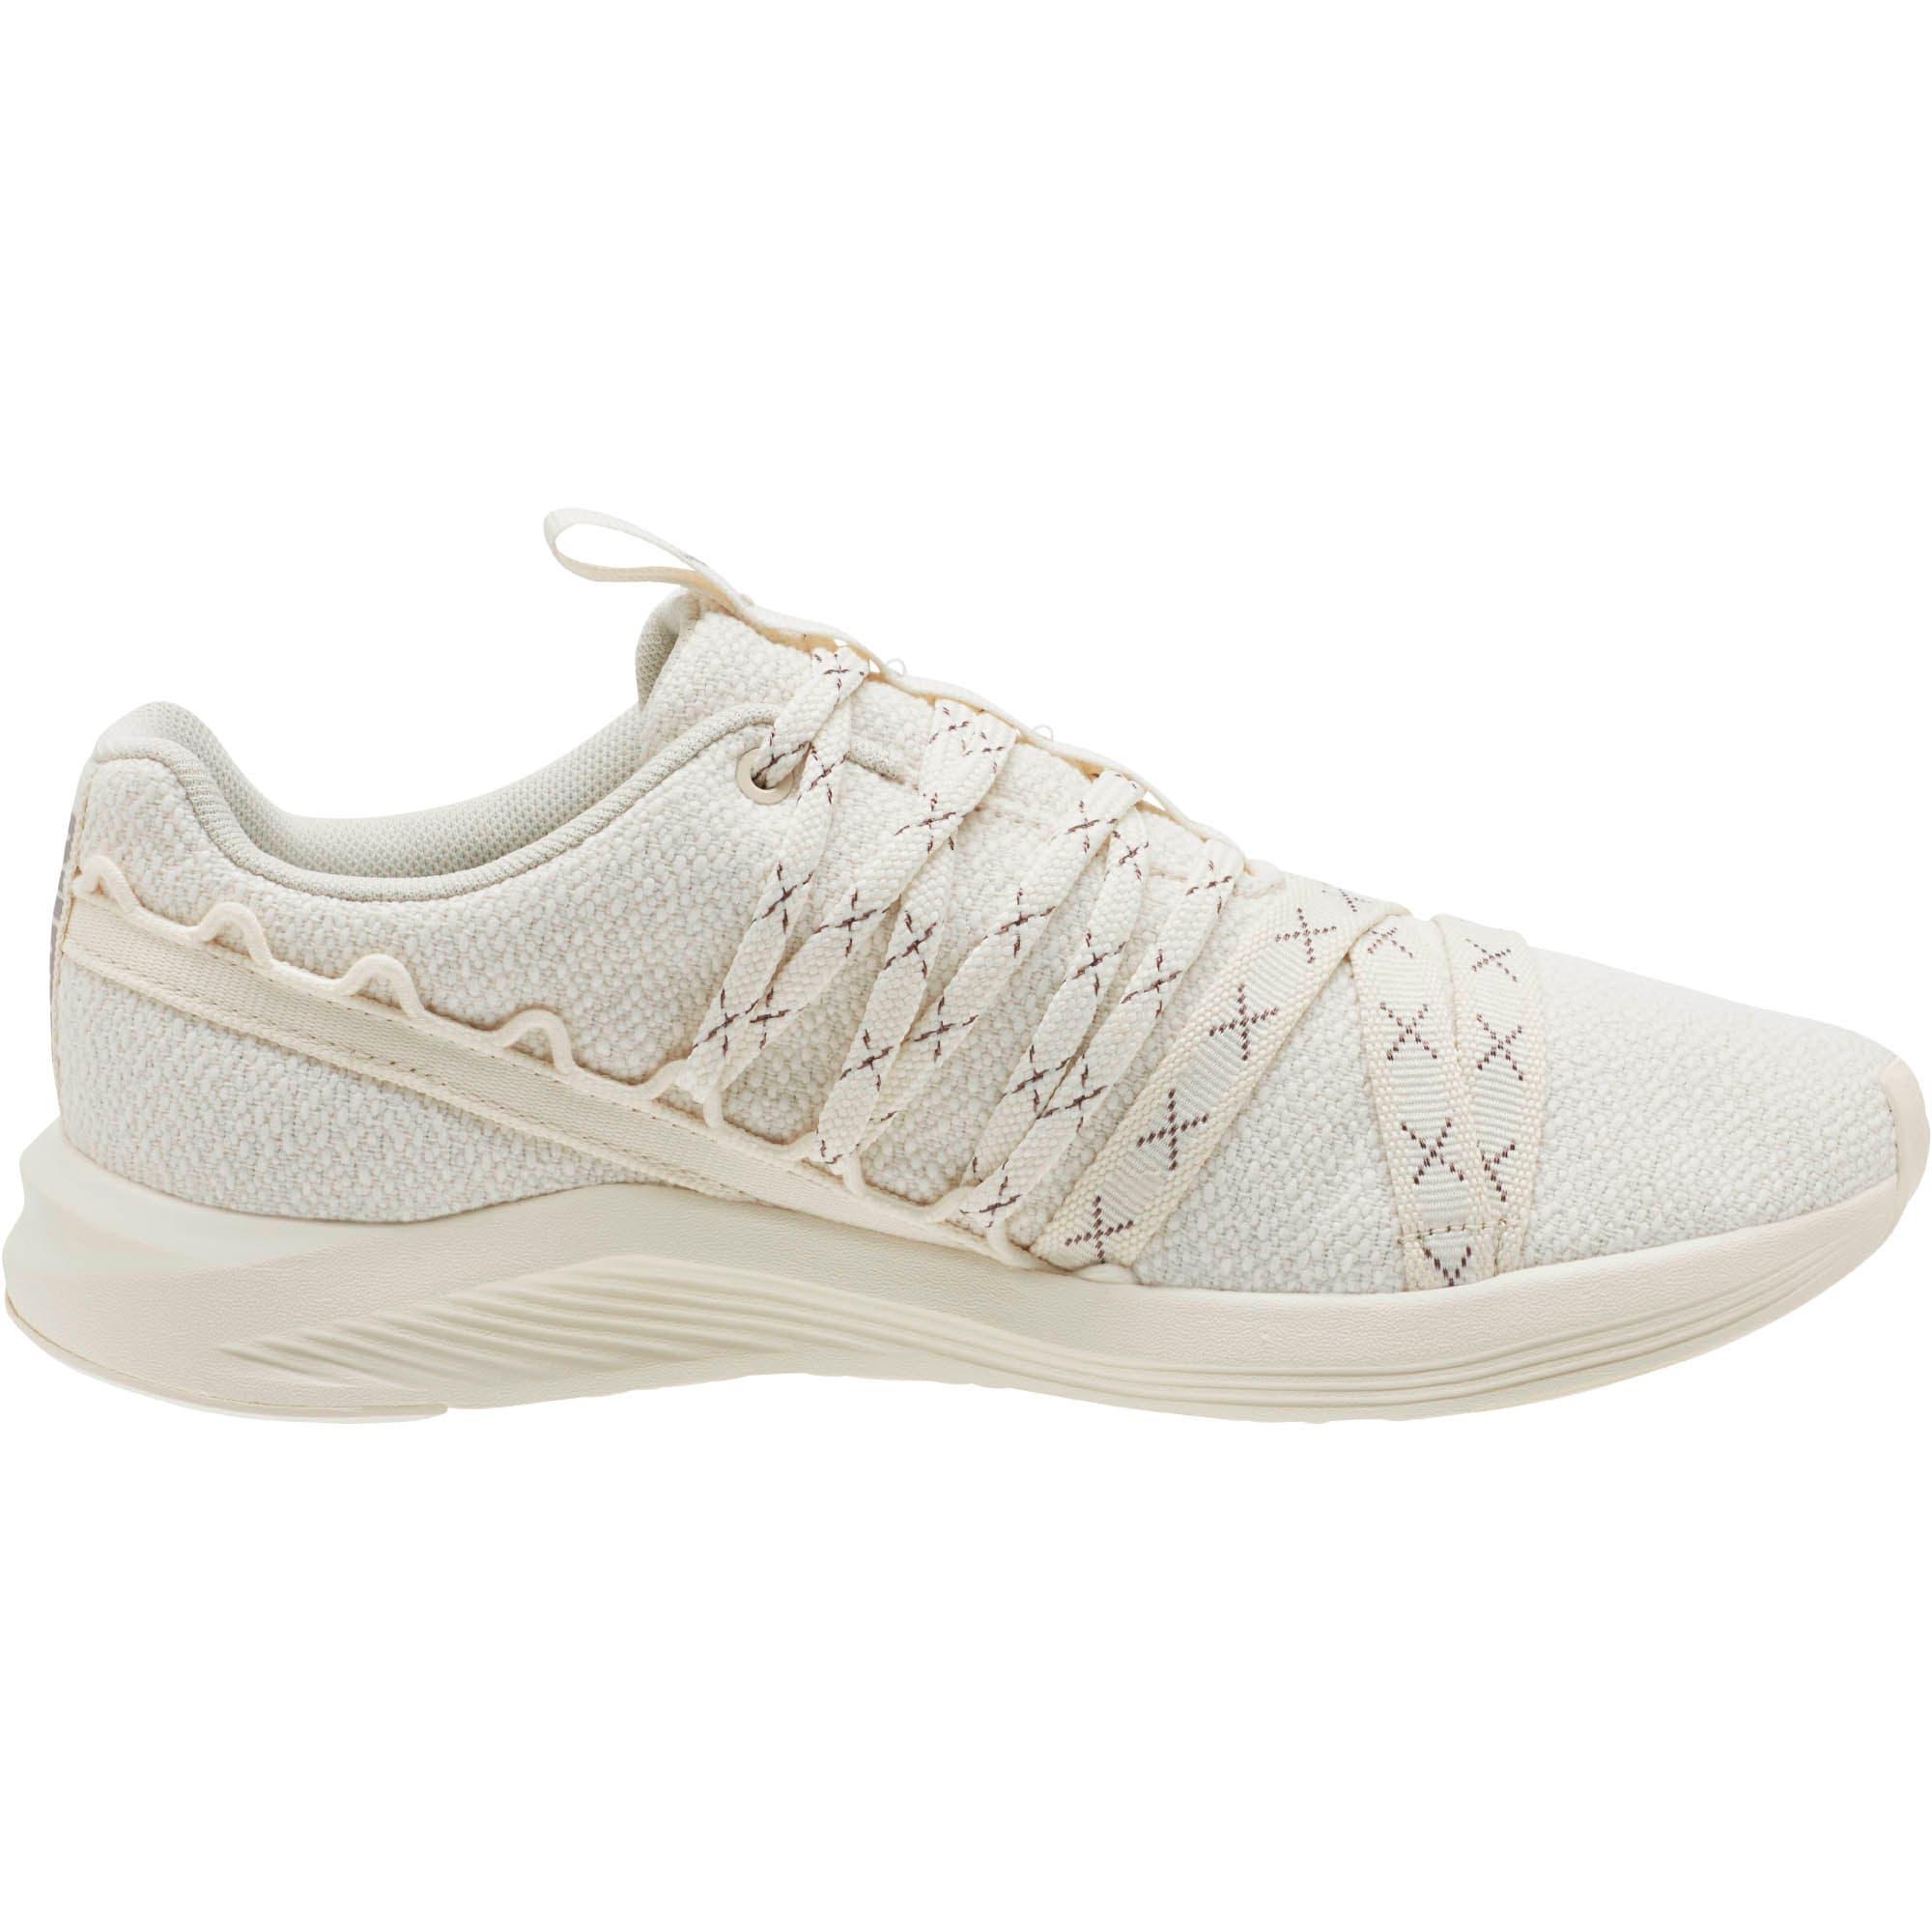 Thumbnail 3 of Prowl Alt 2 LX Women's Training Shoes, Whisper White, medium